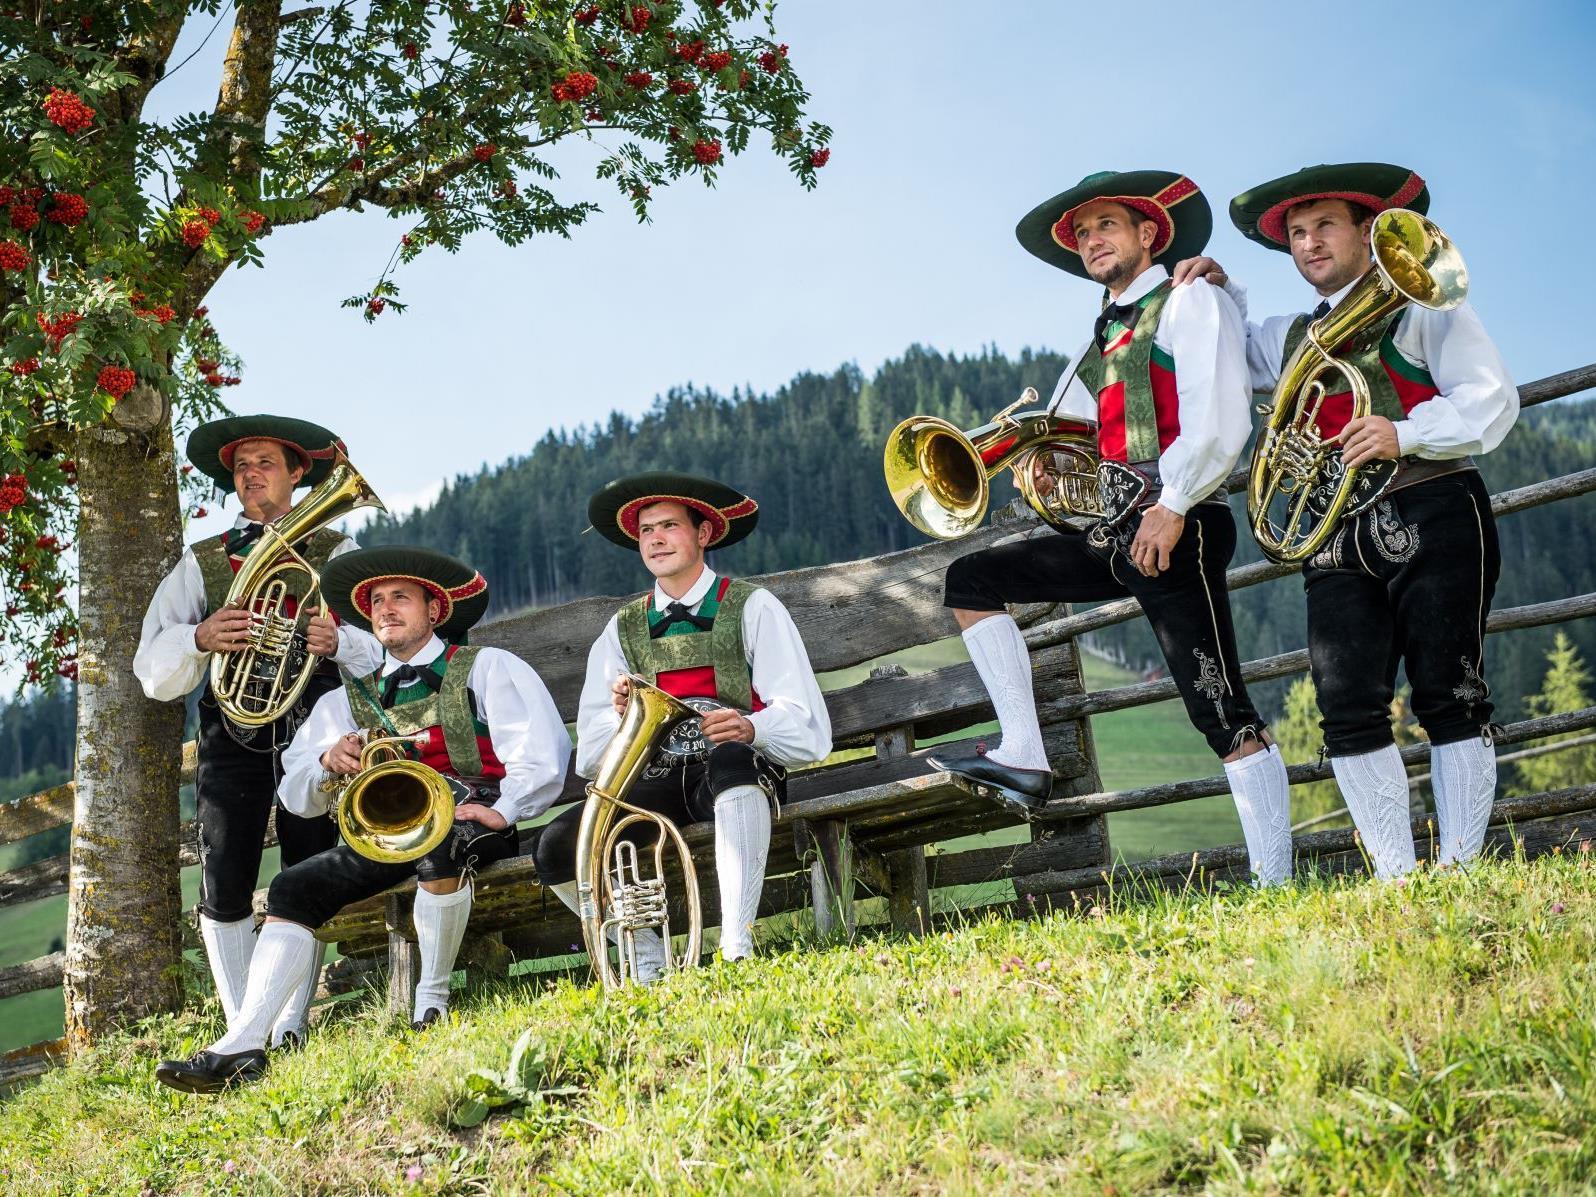 Concert of the music-band Enneberg